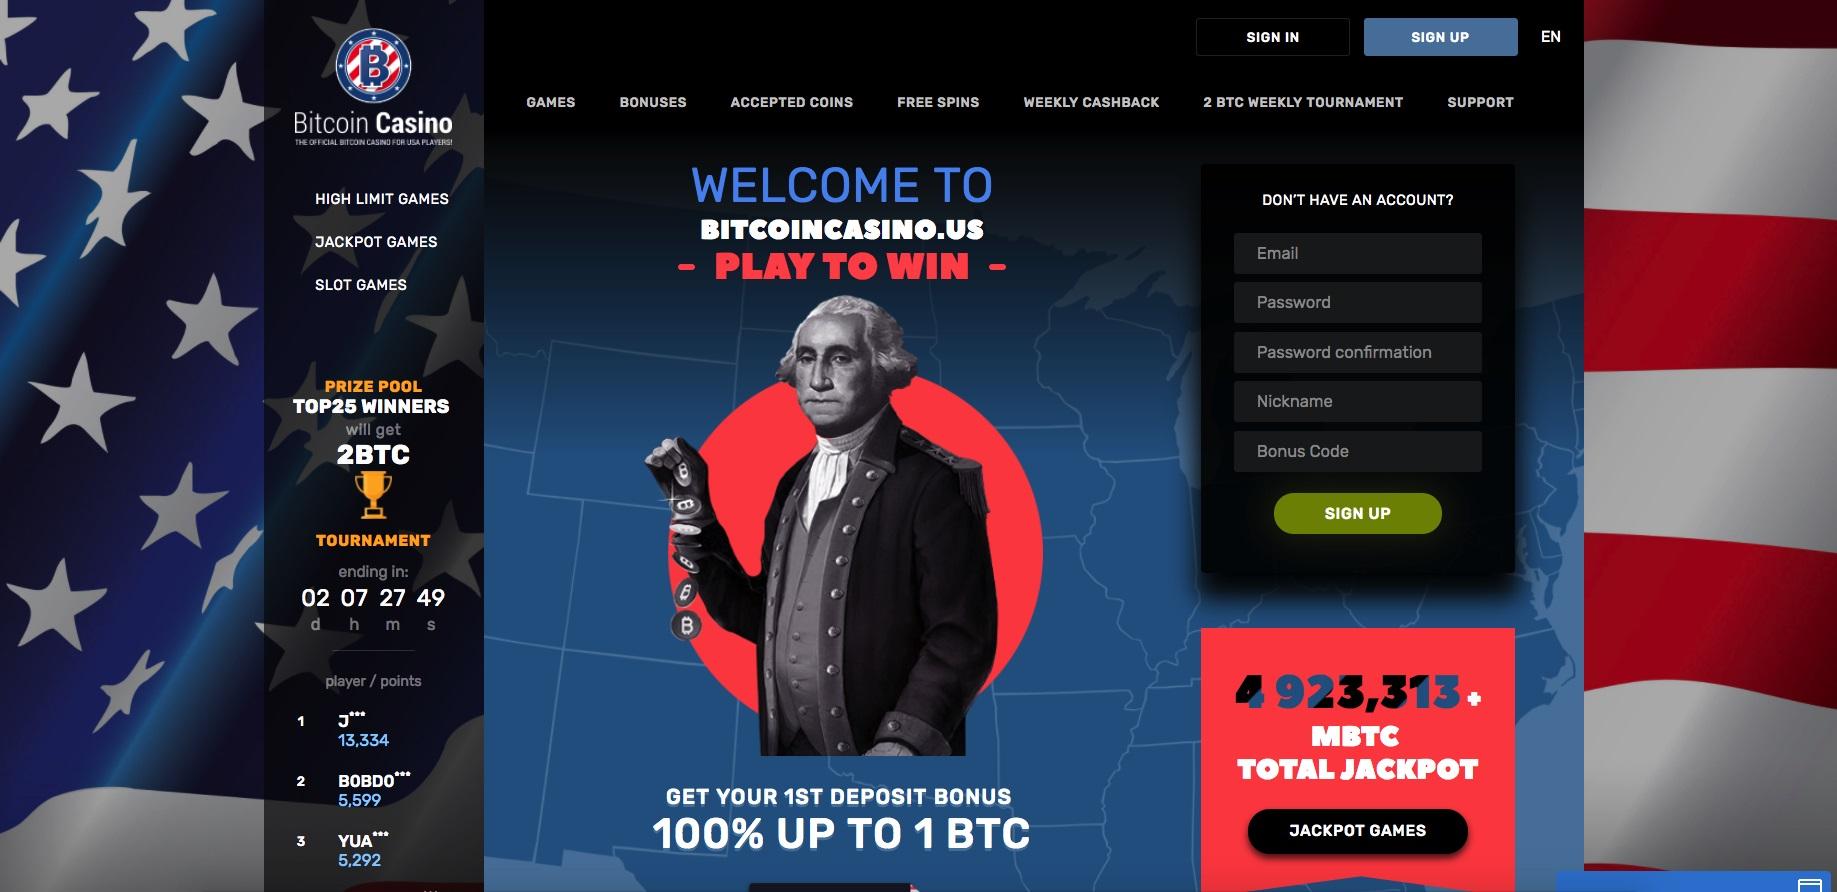 bitcoincasino.us - Bitcoin Casino US